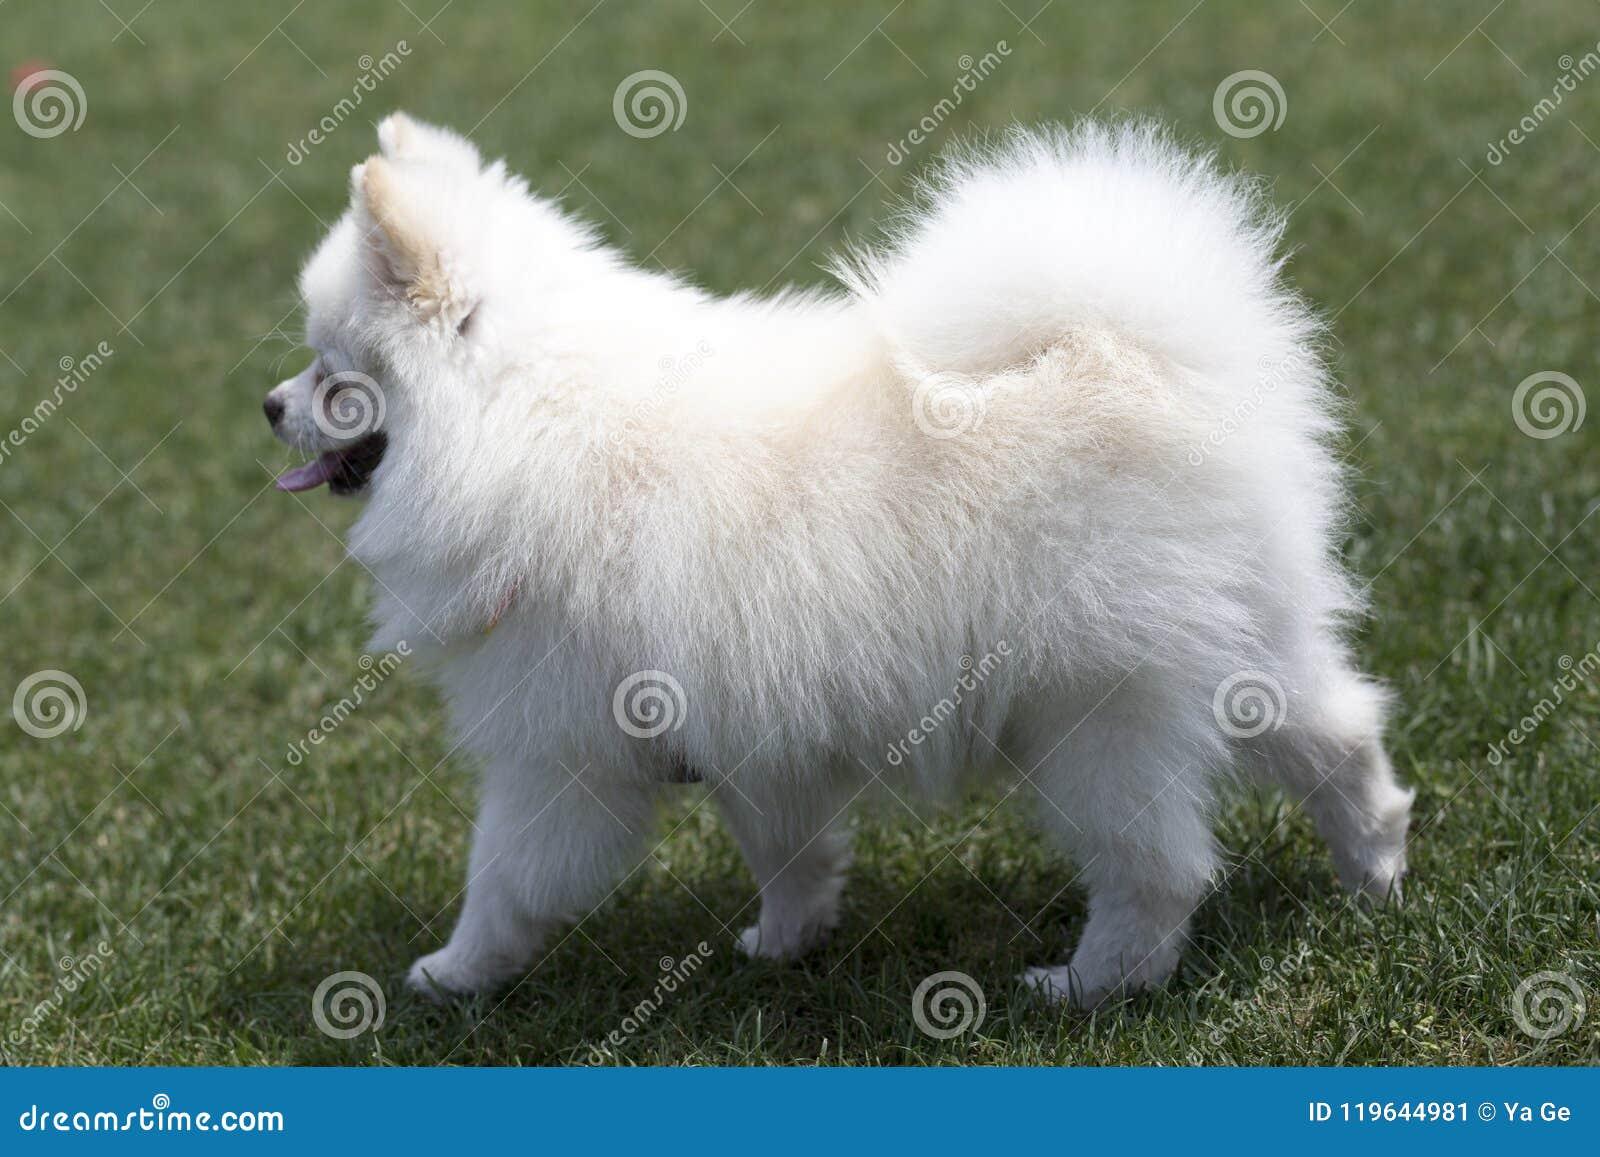 Pomeranian Stock Image Image Of Sunshine Small Squirrel 119644981